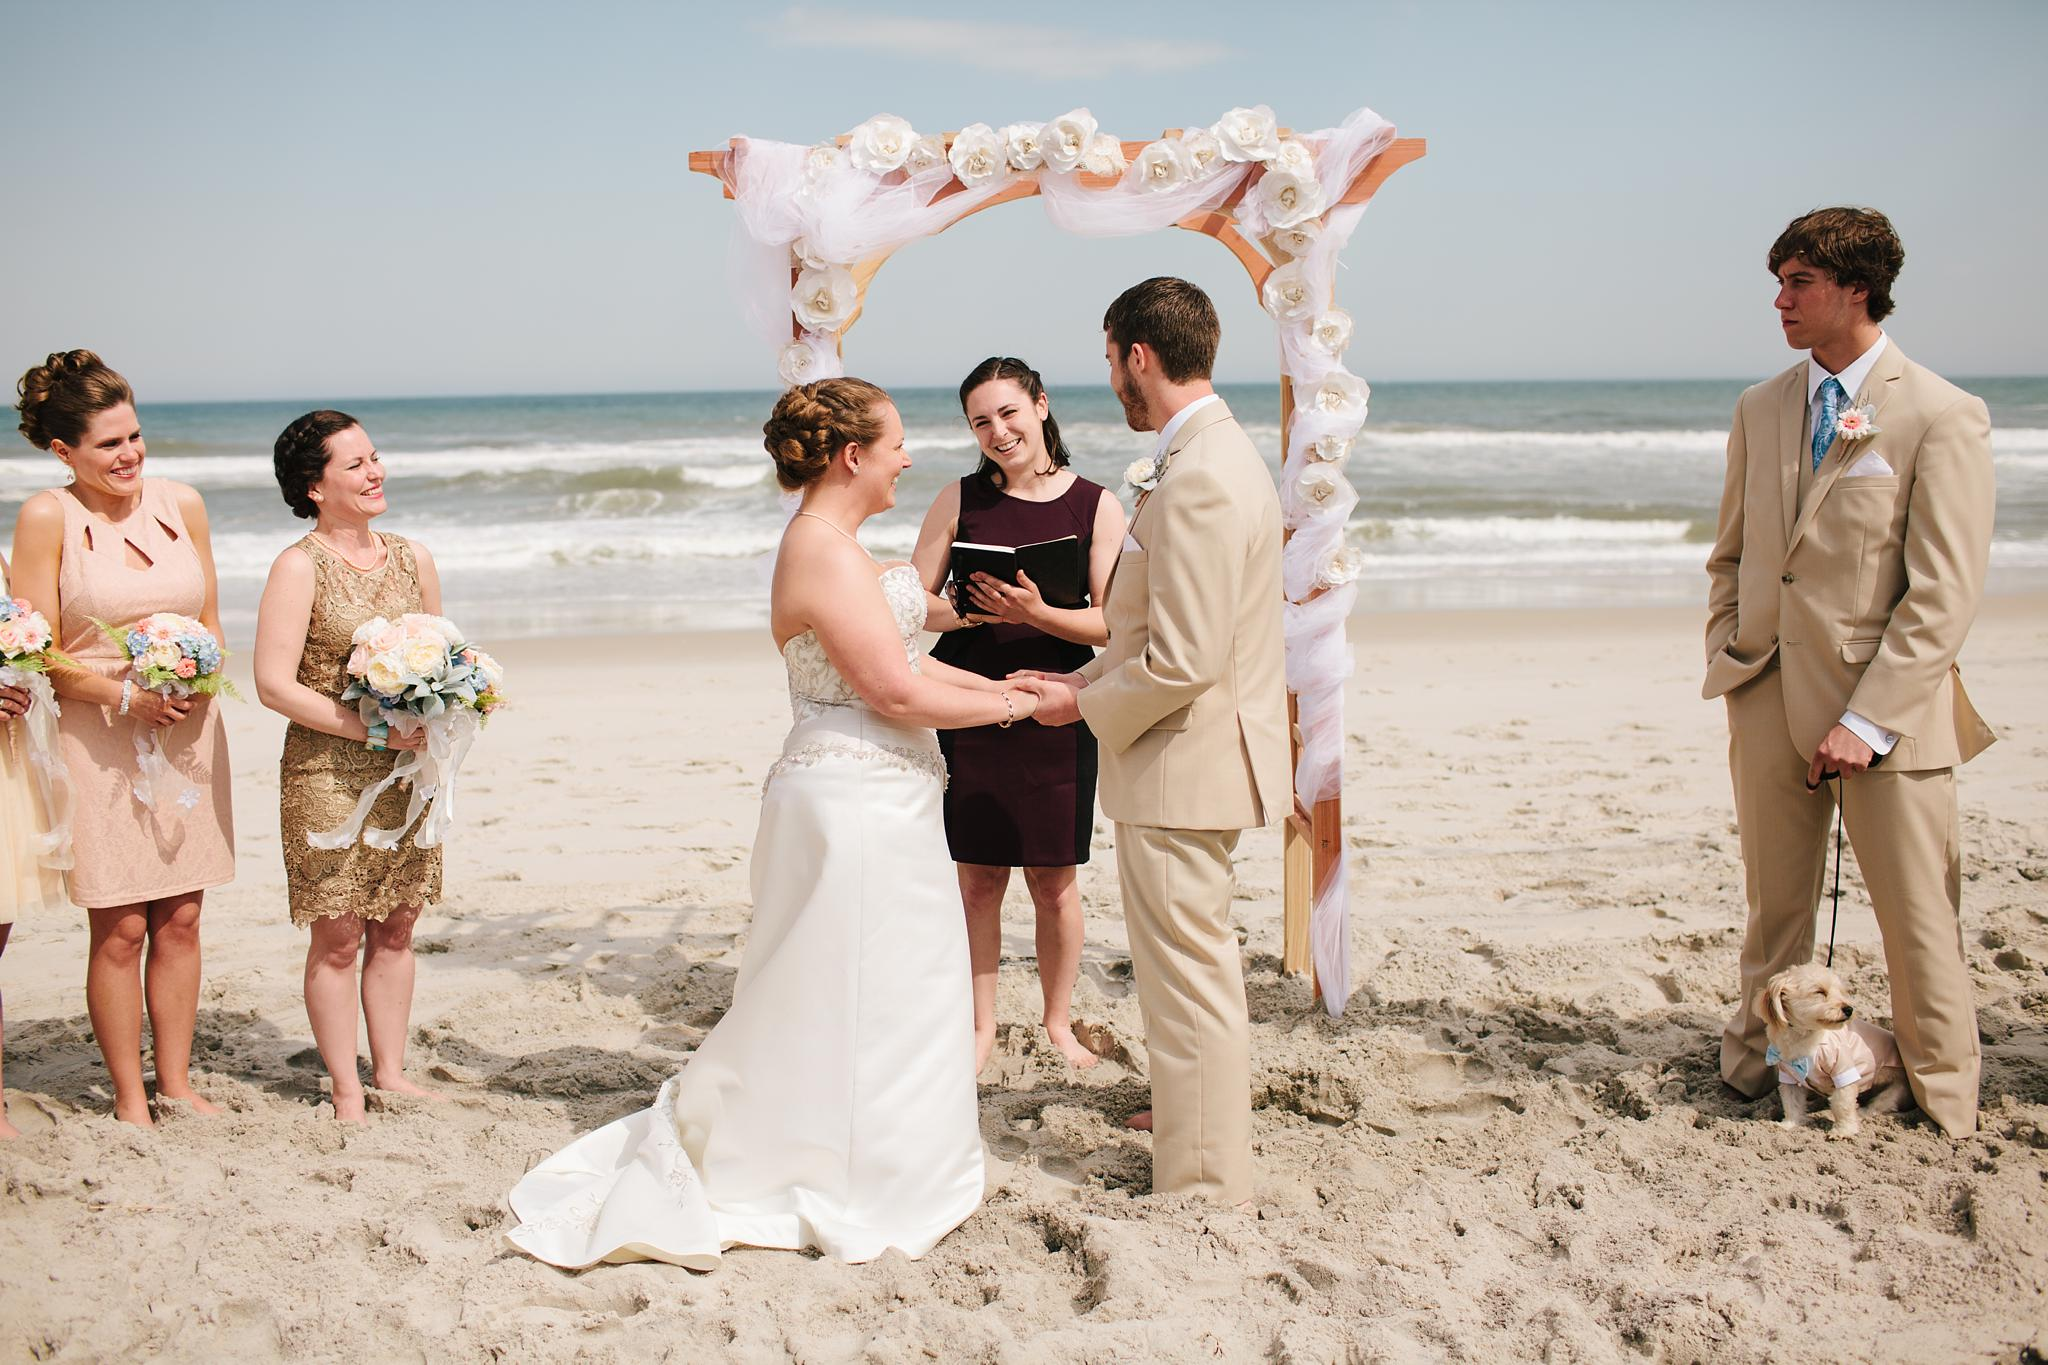 brant_beach_yacht_club_wedding_long_beach_island_nj_wedding_photographer_397.jpg